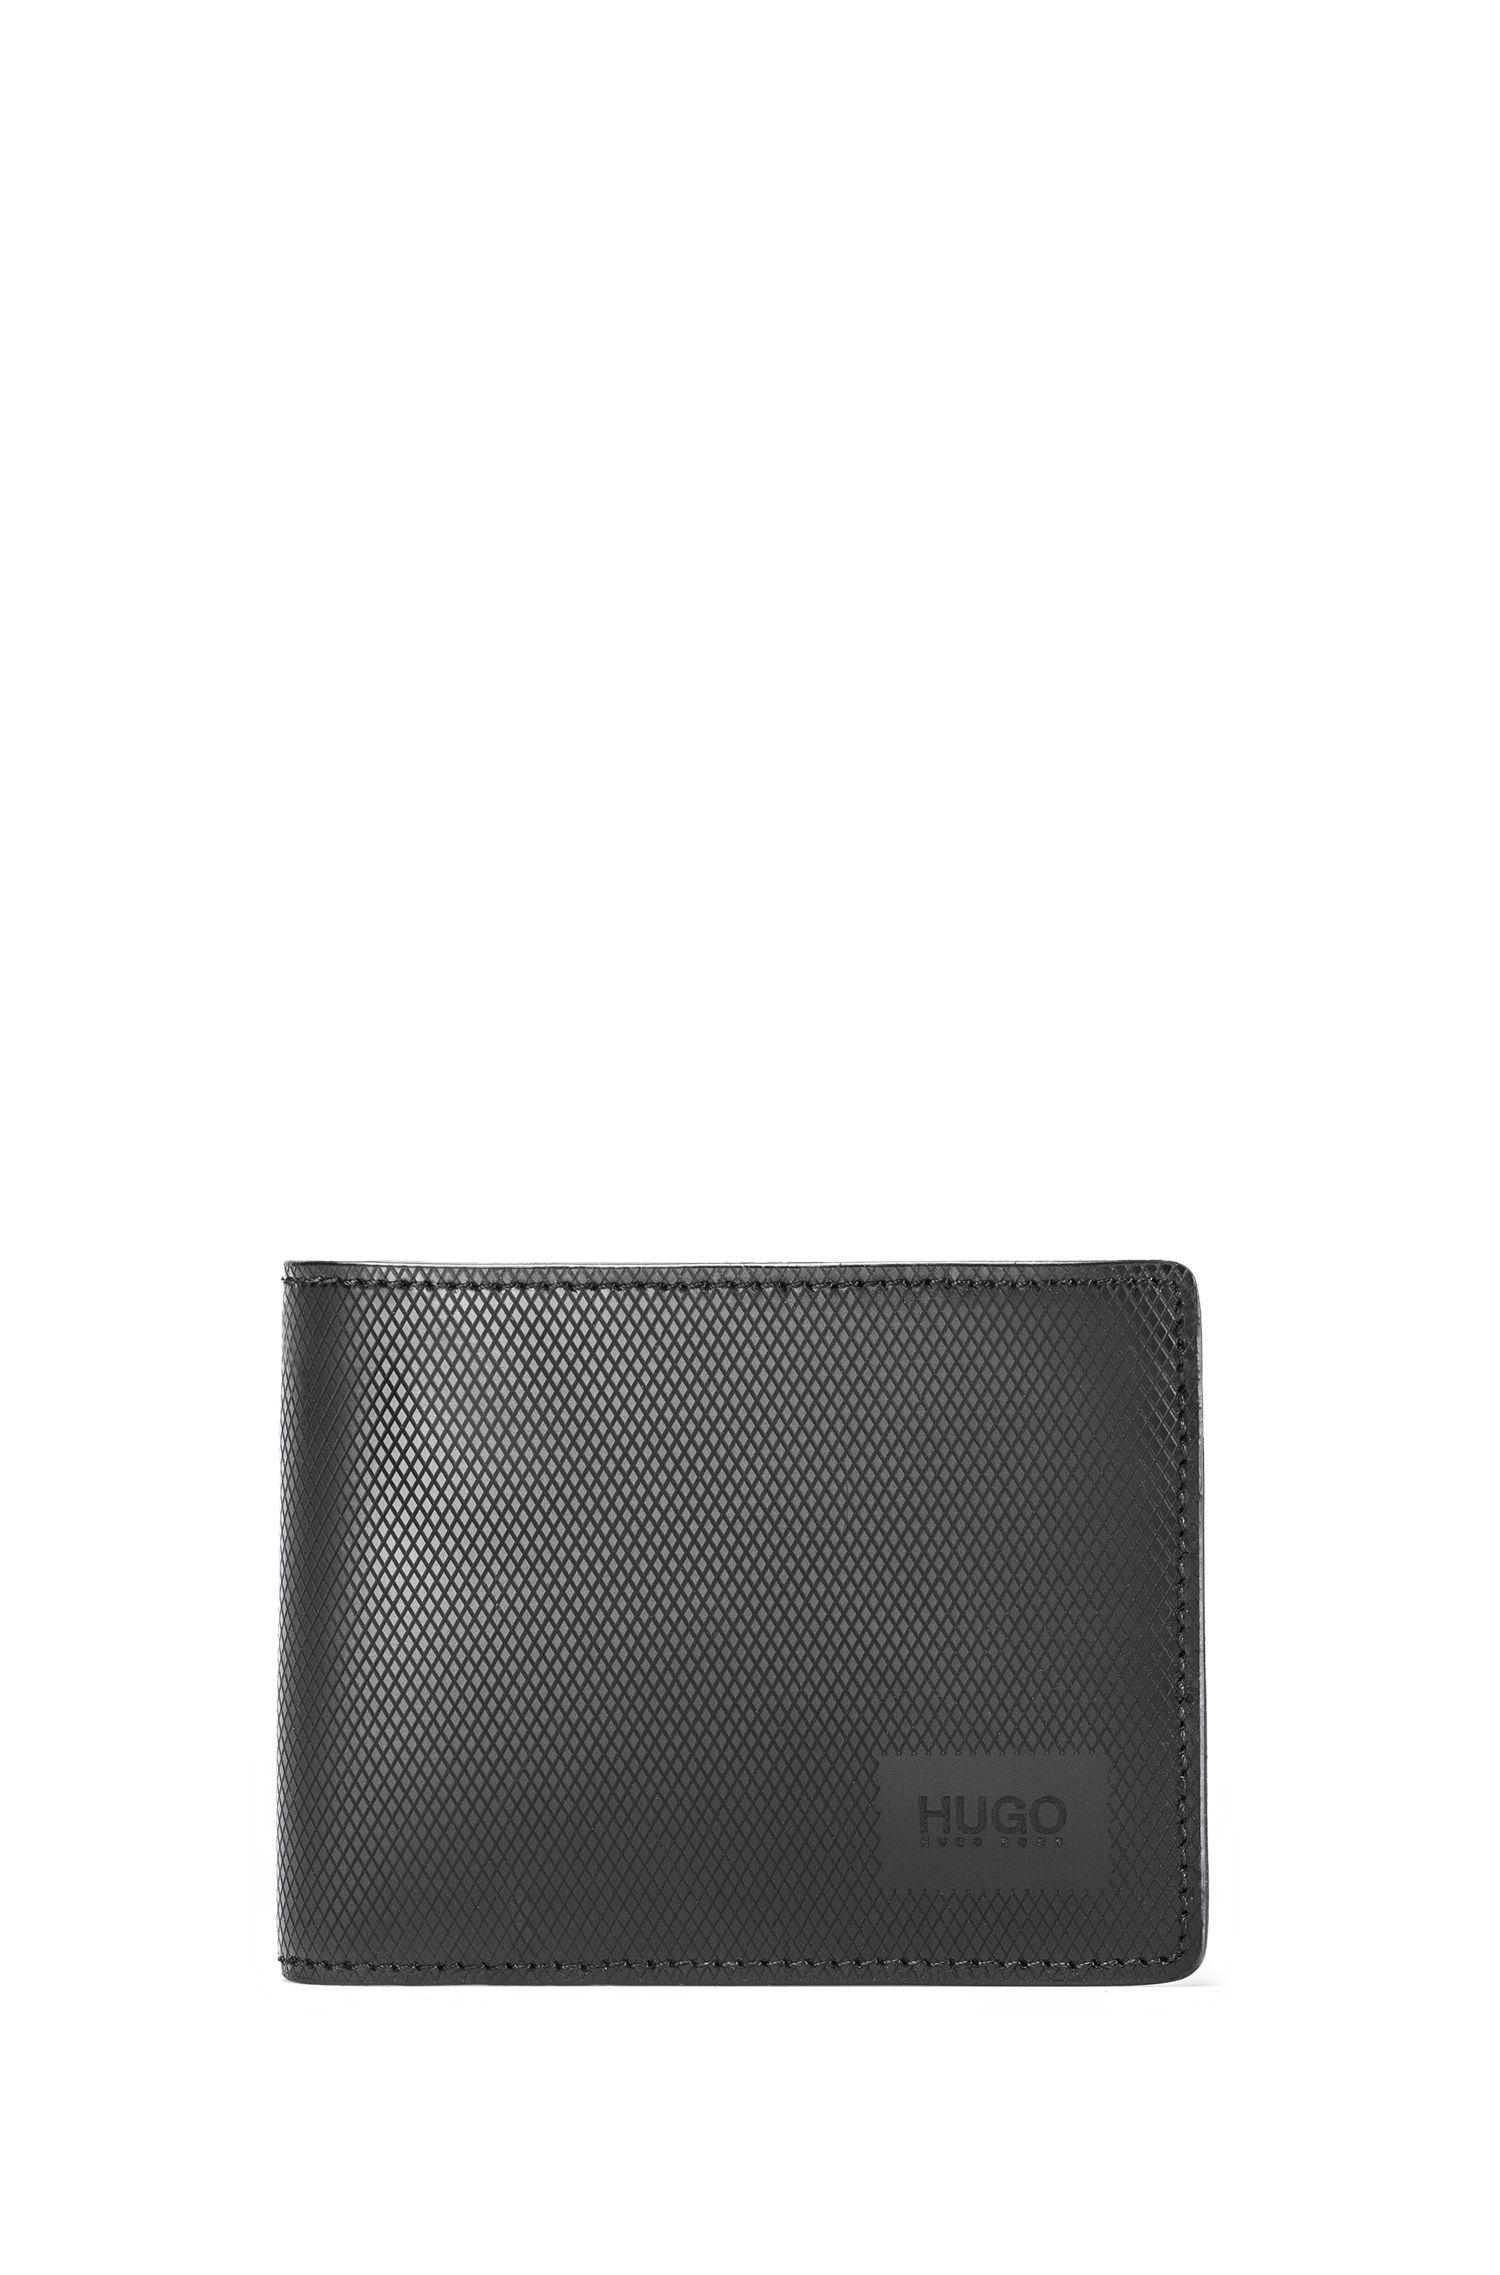 Leather Billfold Wallet | Mercury 6 CC